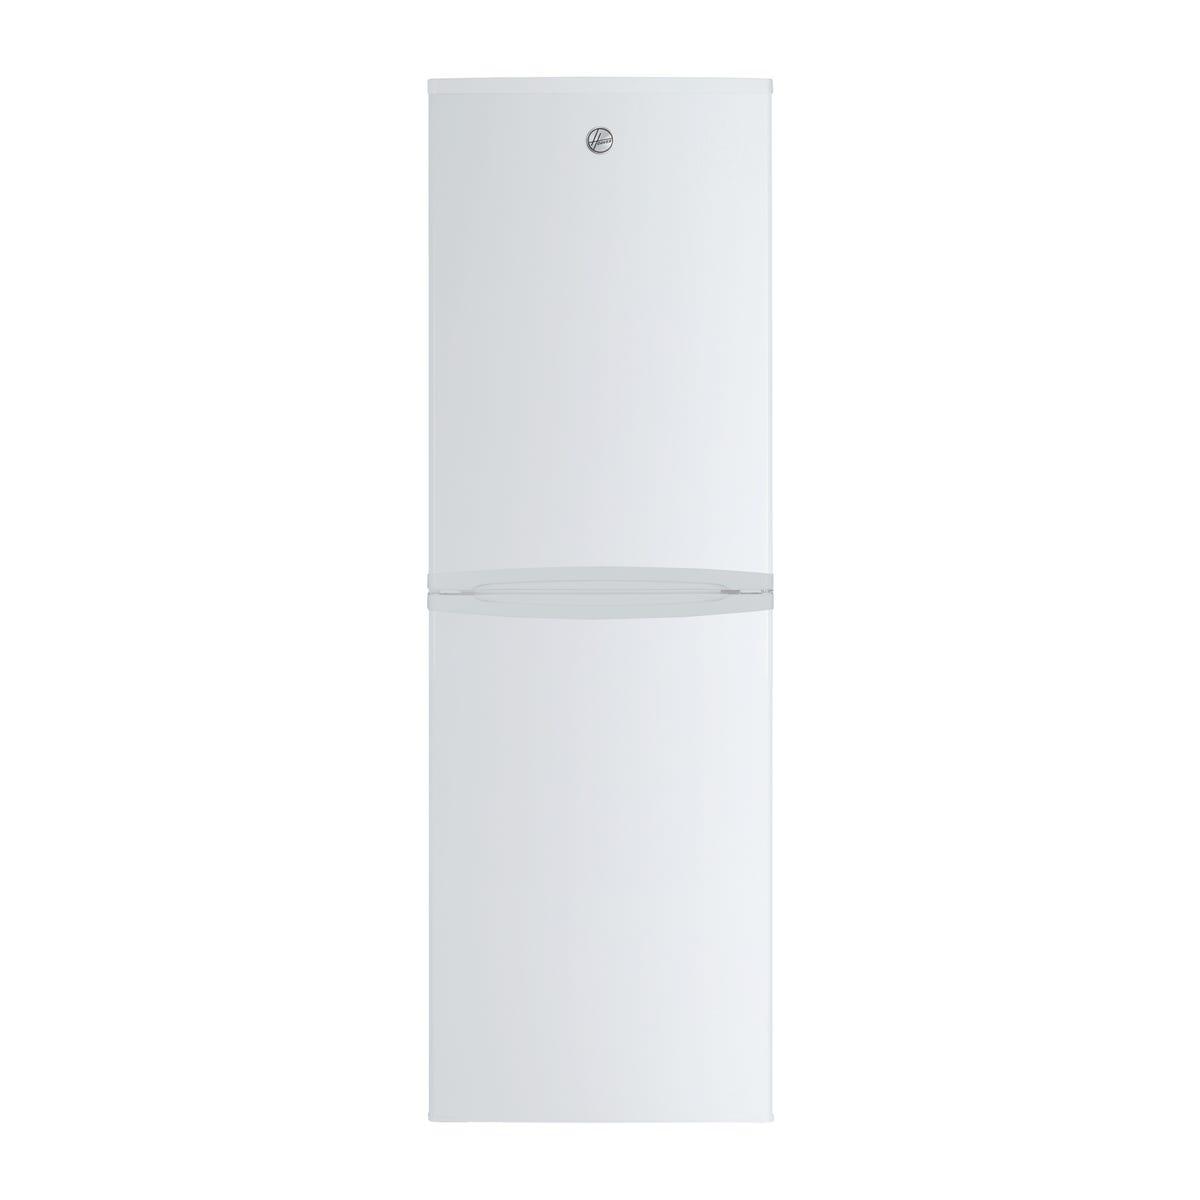 Hoover HSC 577WKN 138L/110L Freestanding Static Fridge Freezer - White